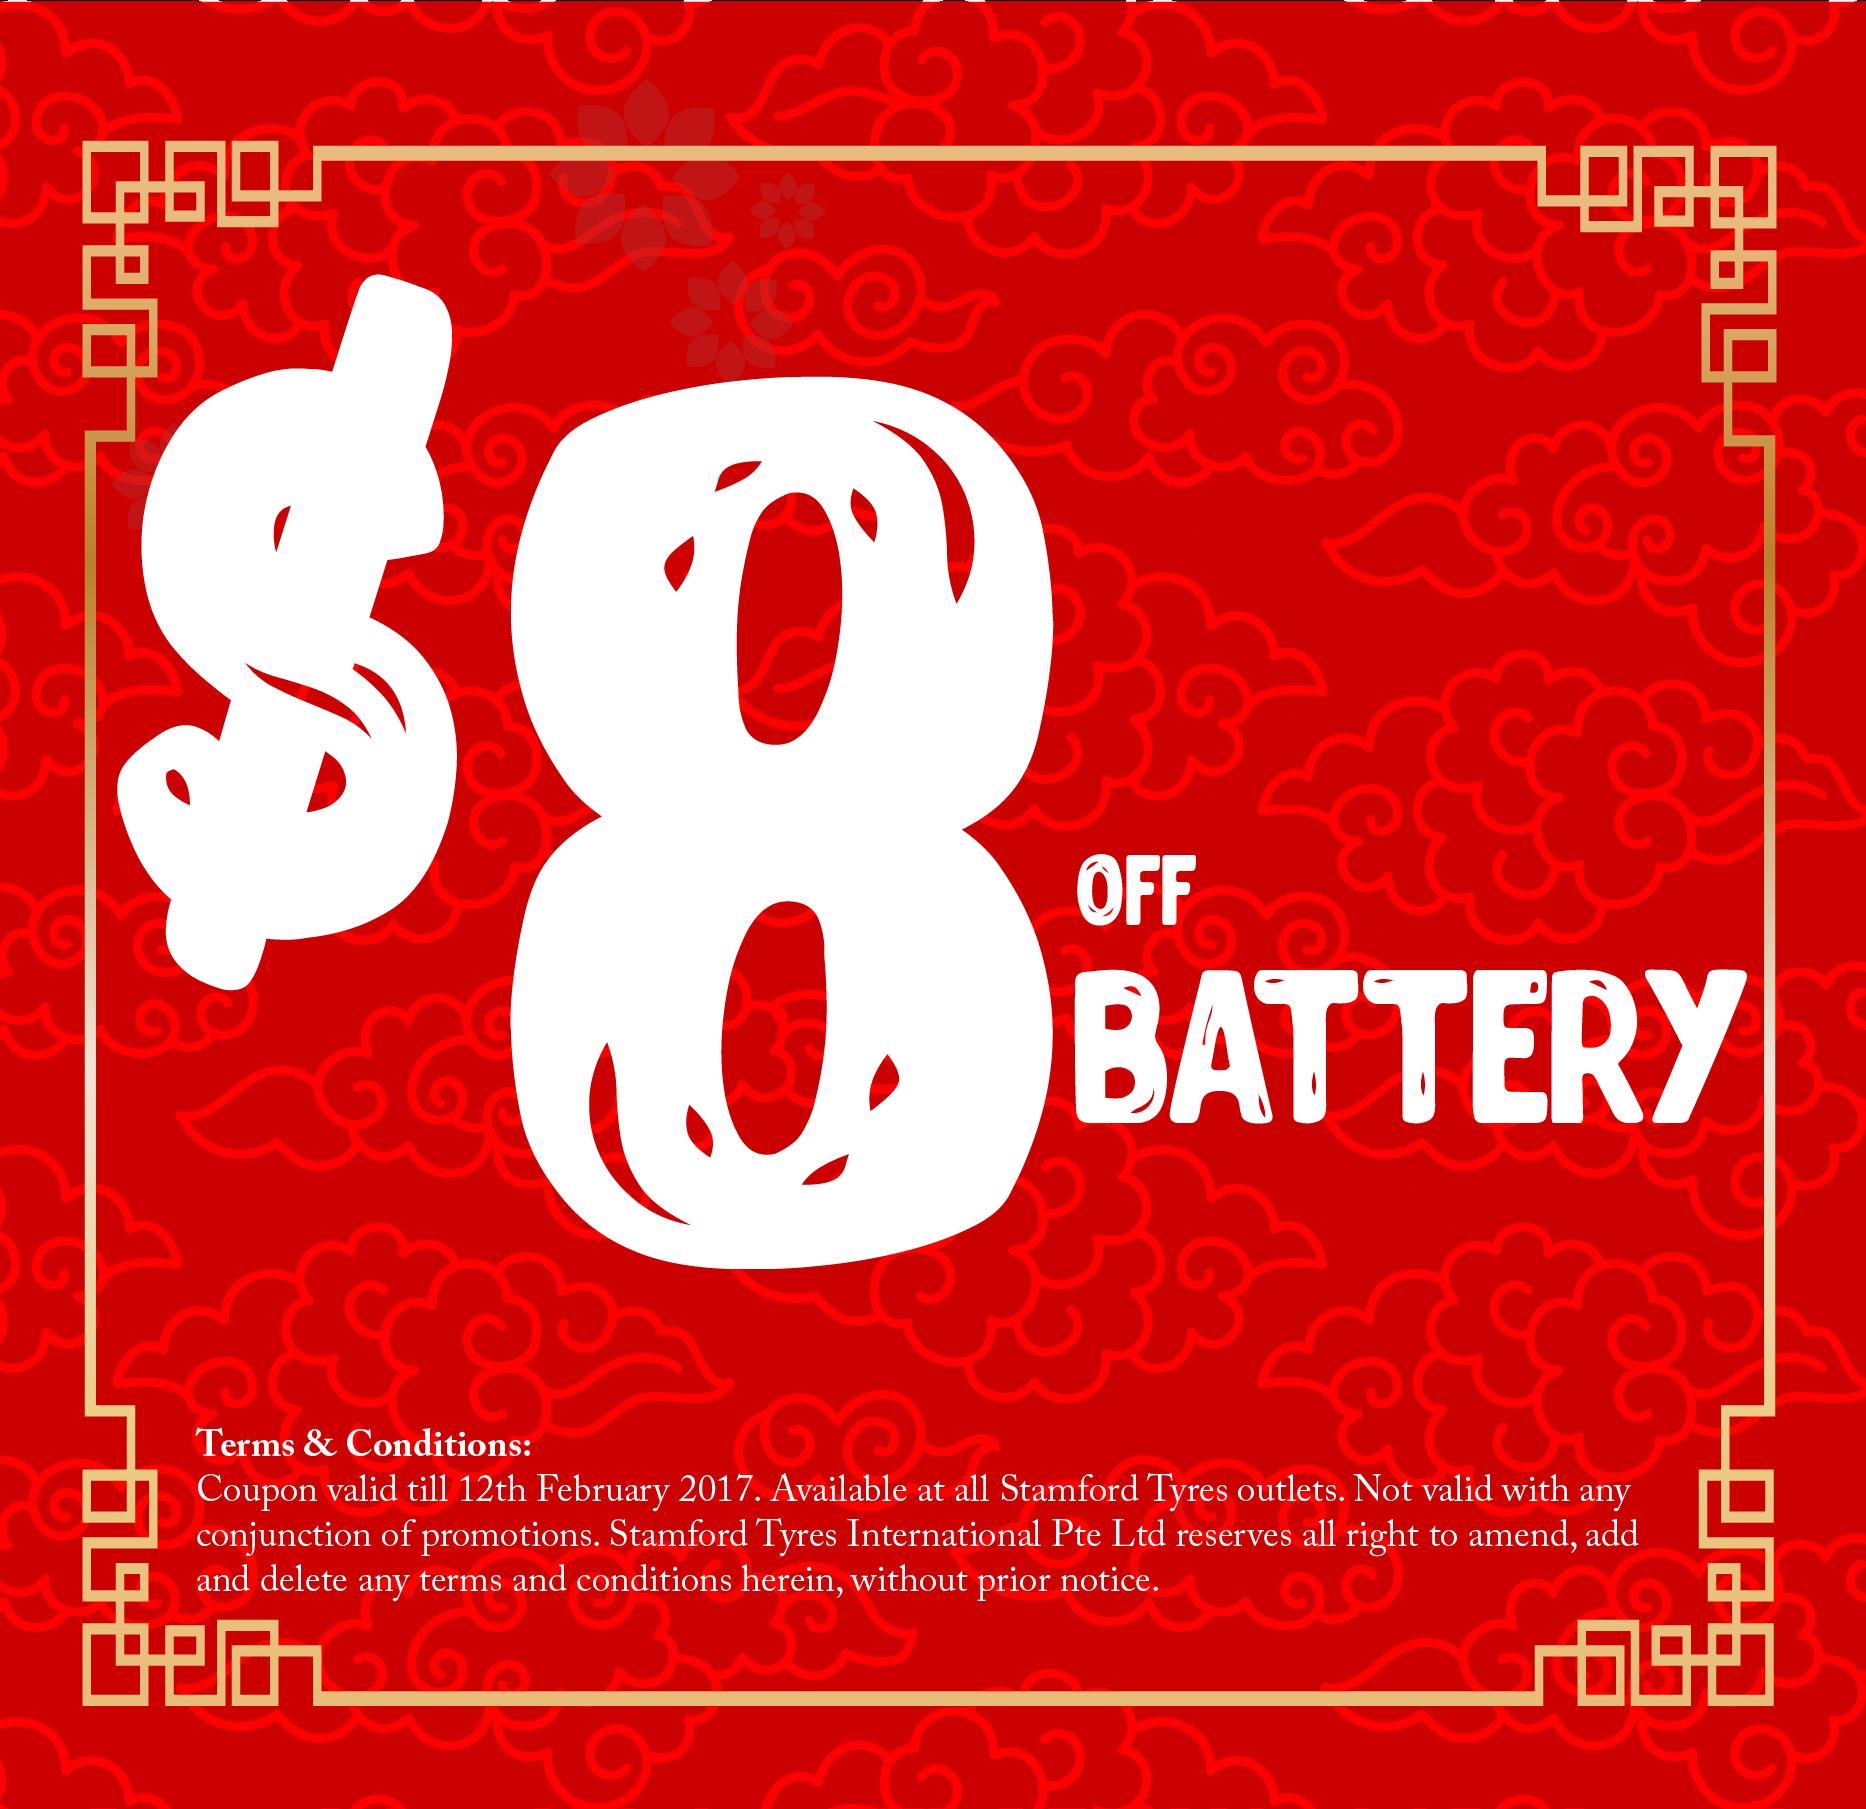 fb-battery-01